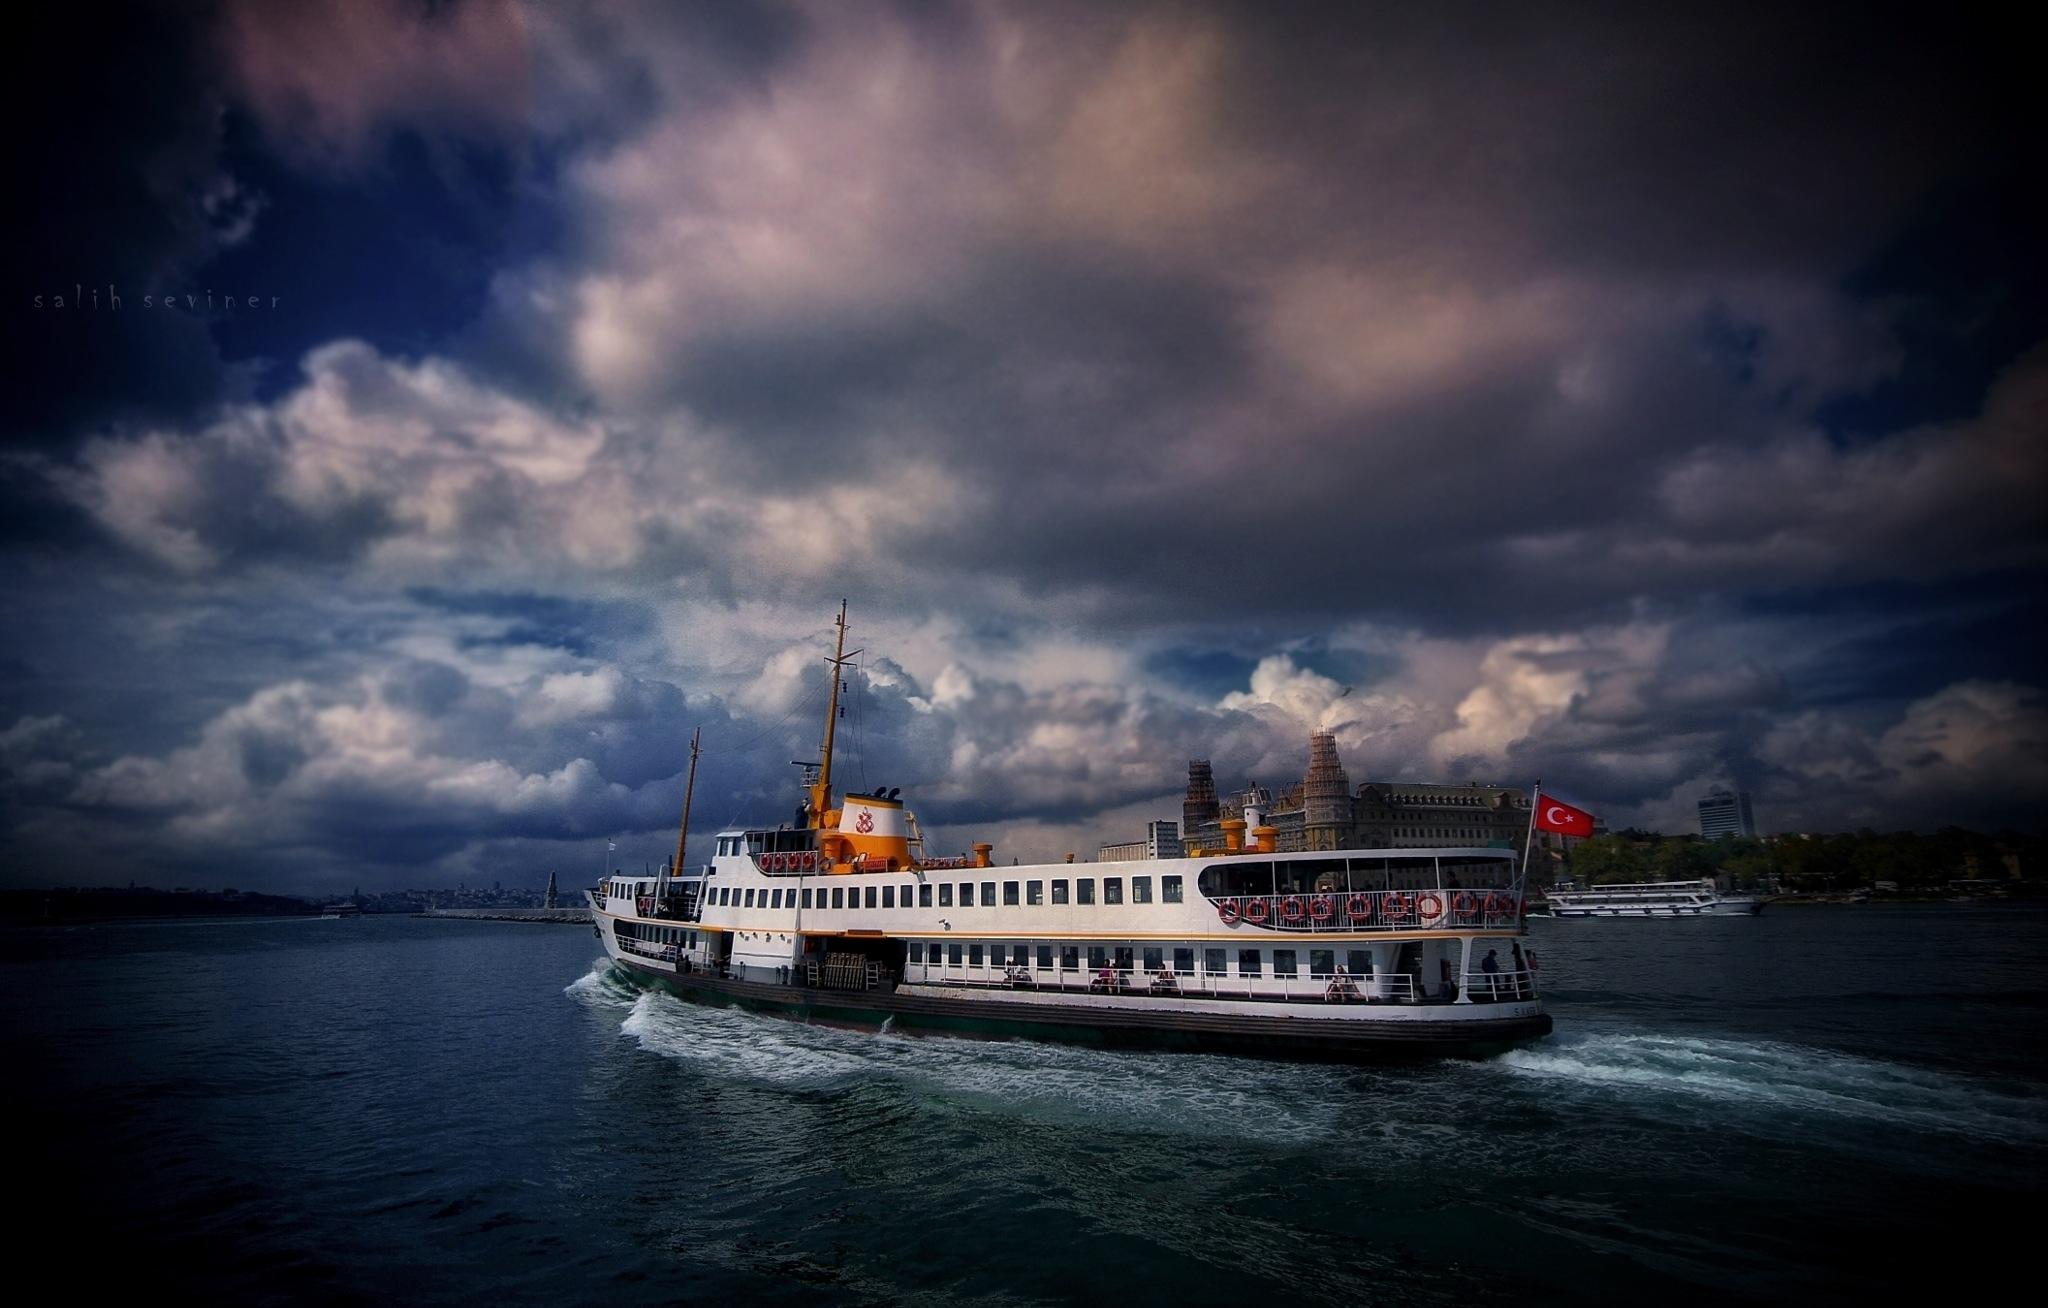 Istanbul stories - ritual.. by Salih Seviner